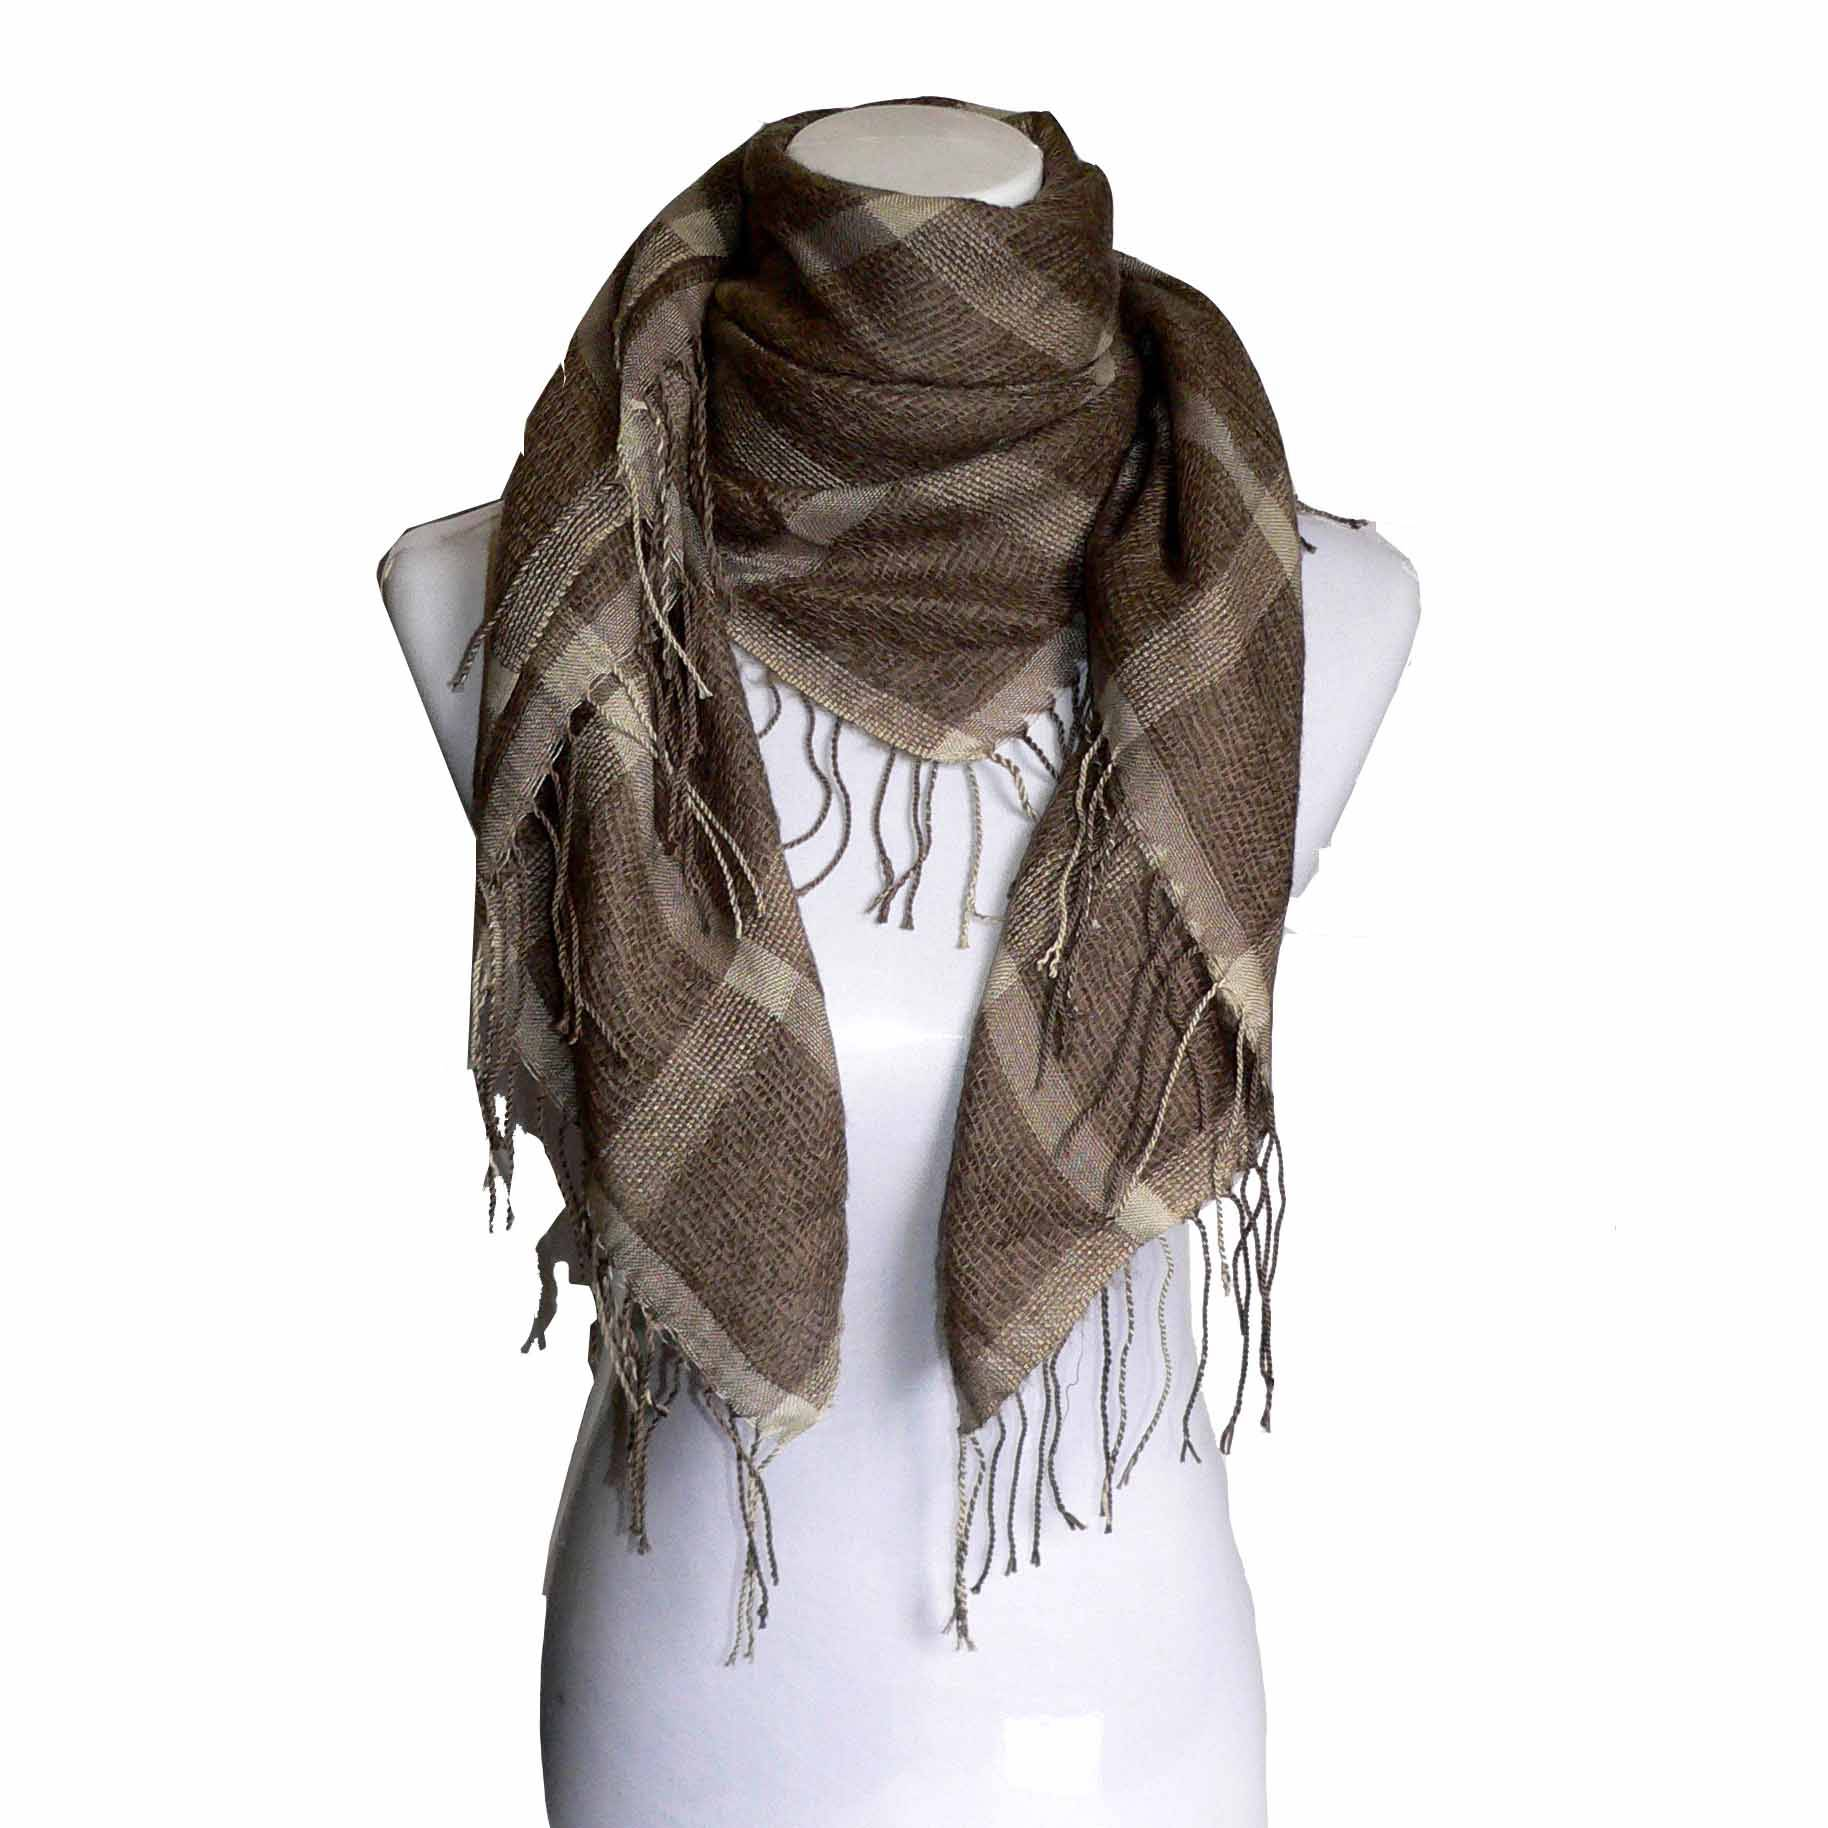 Mohair grid scarf